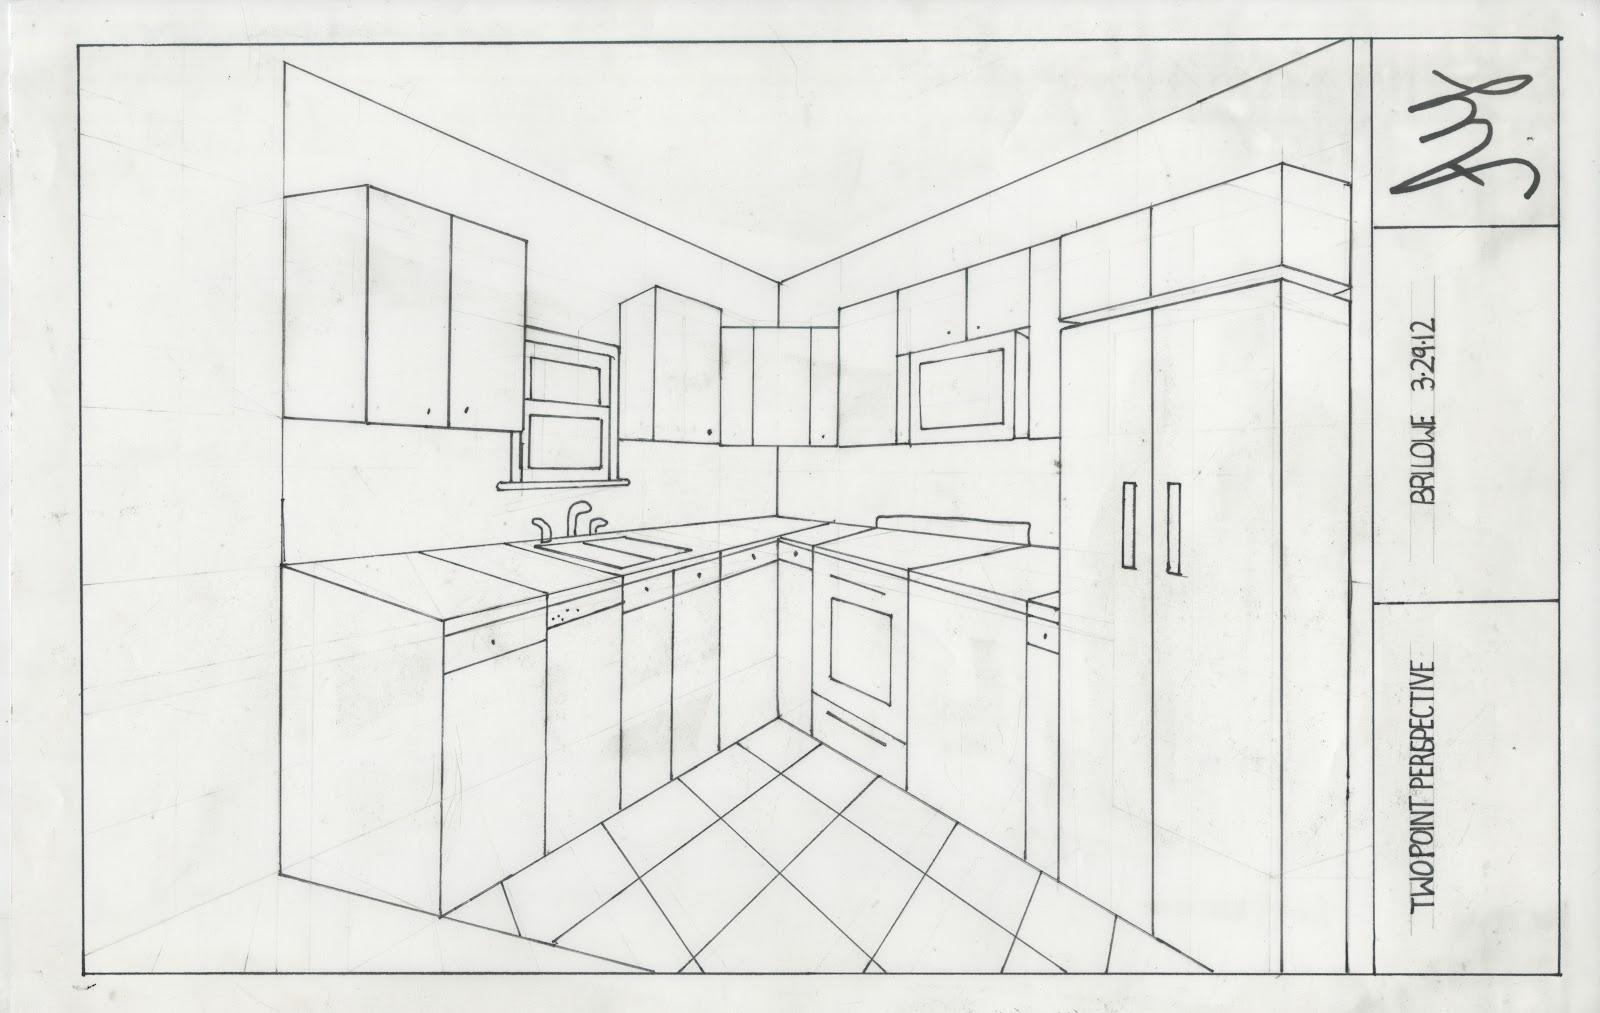 2 point kitchen perspective - معمارسرا